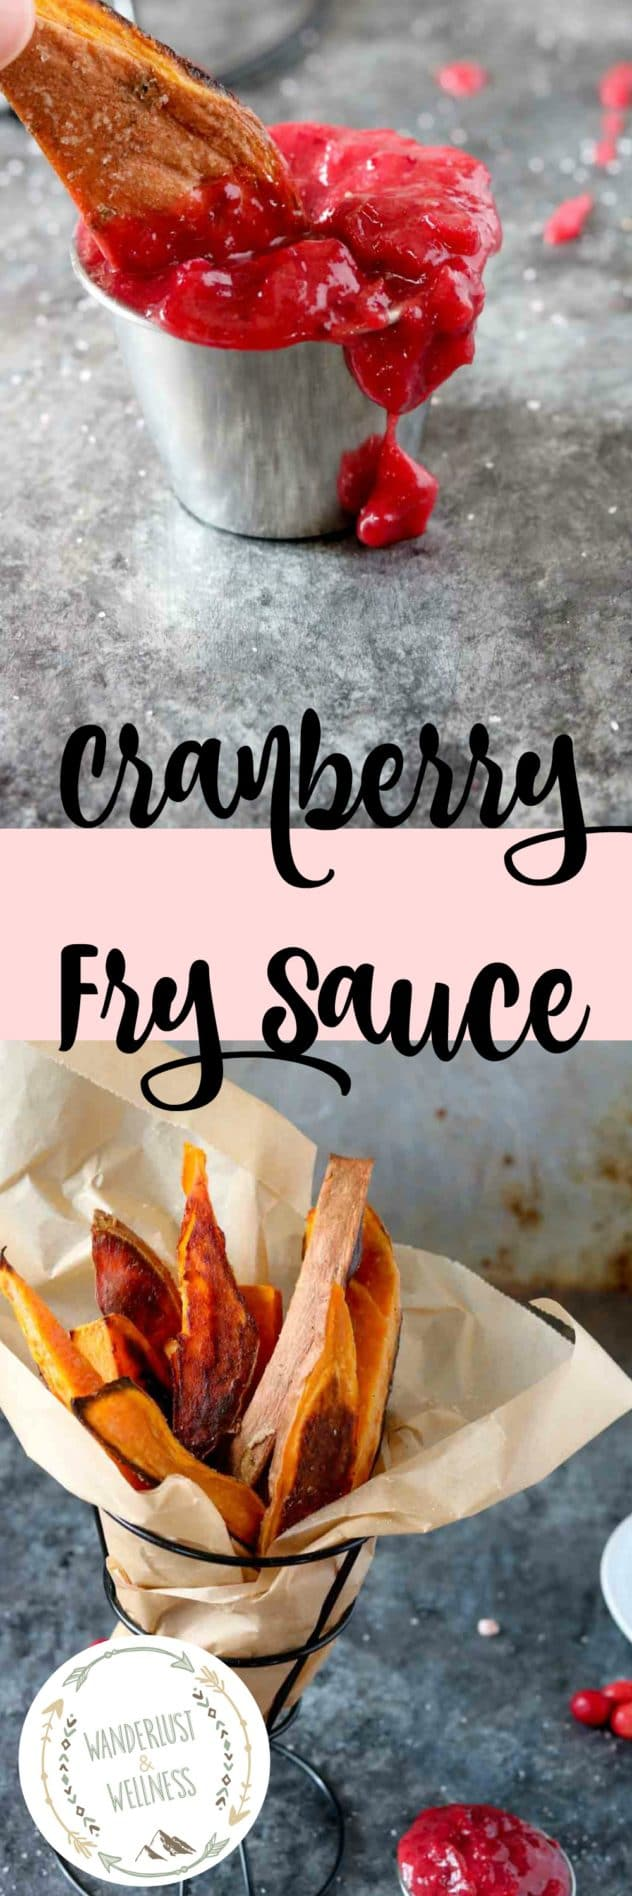 Cranberry Fry Sauce